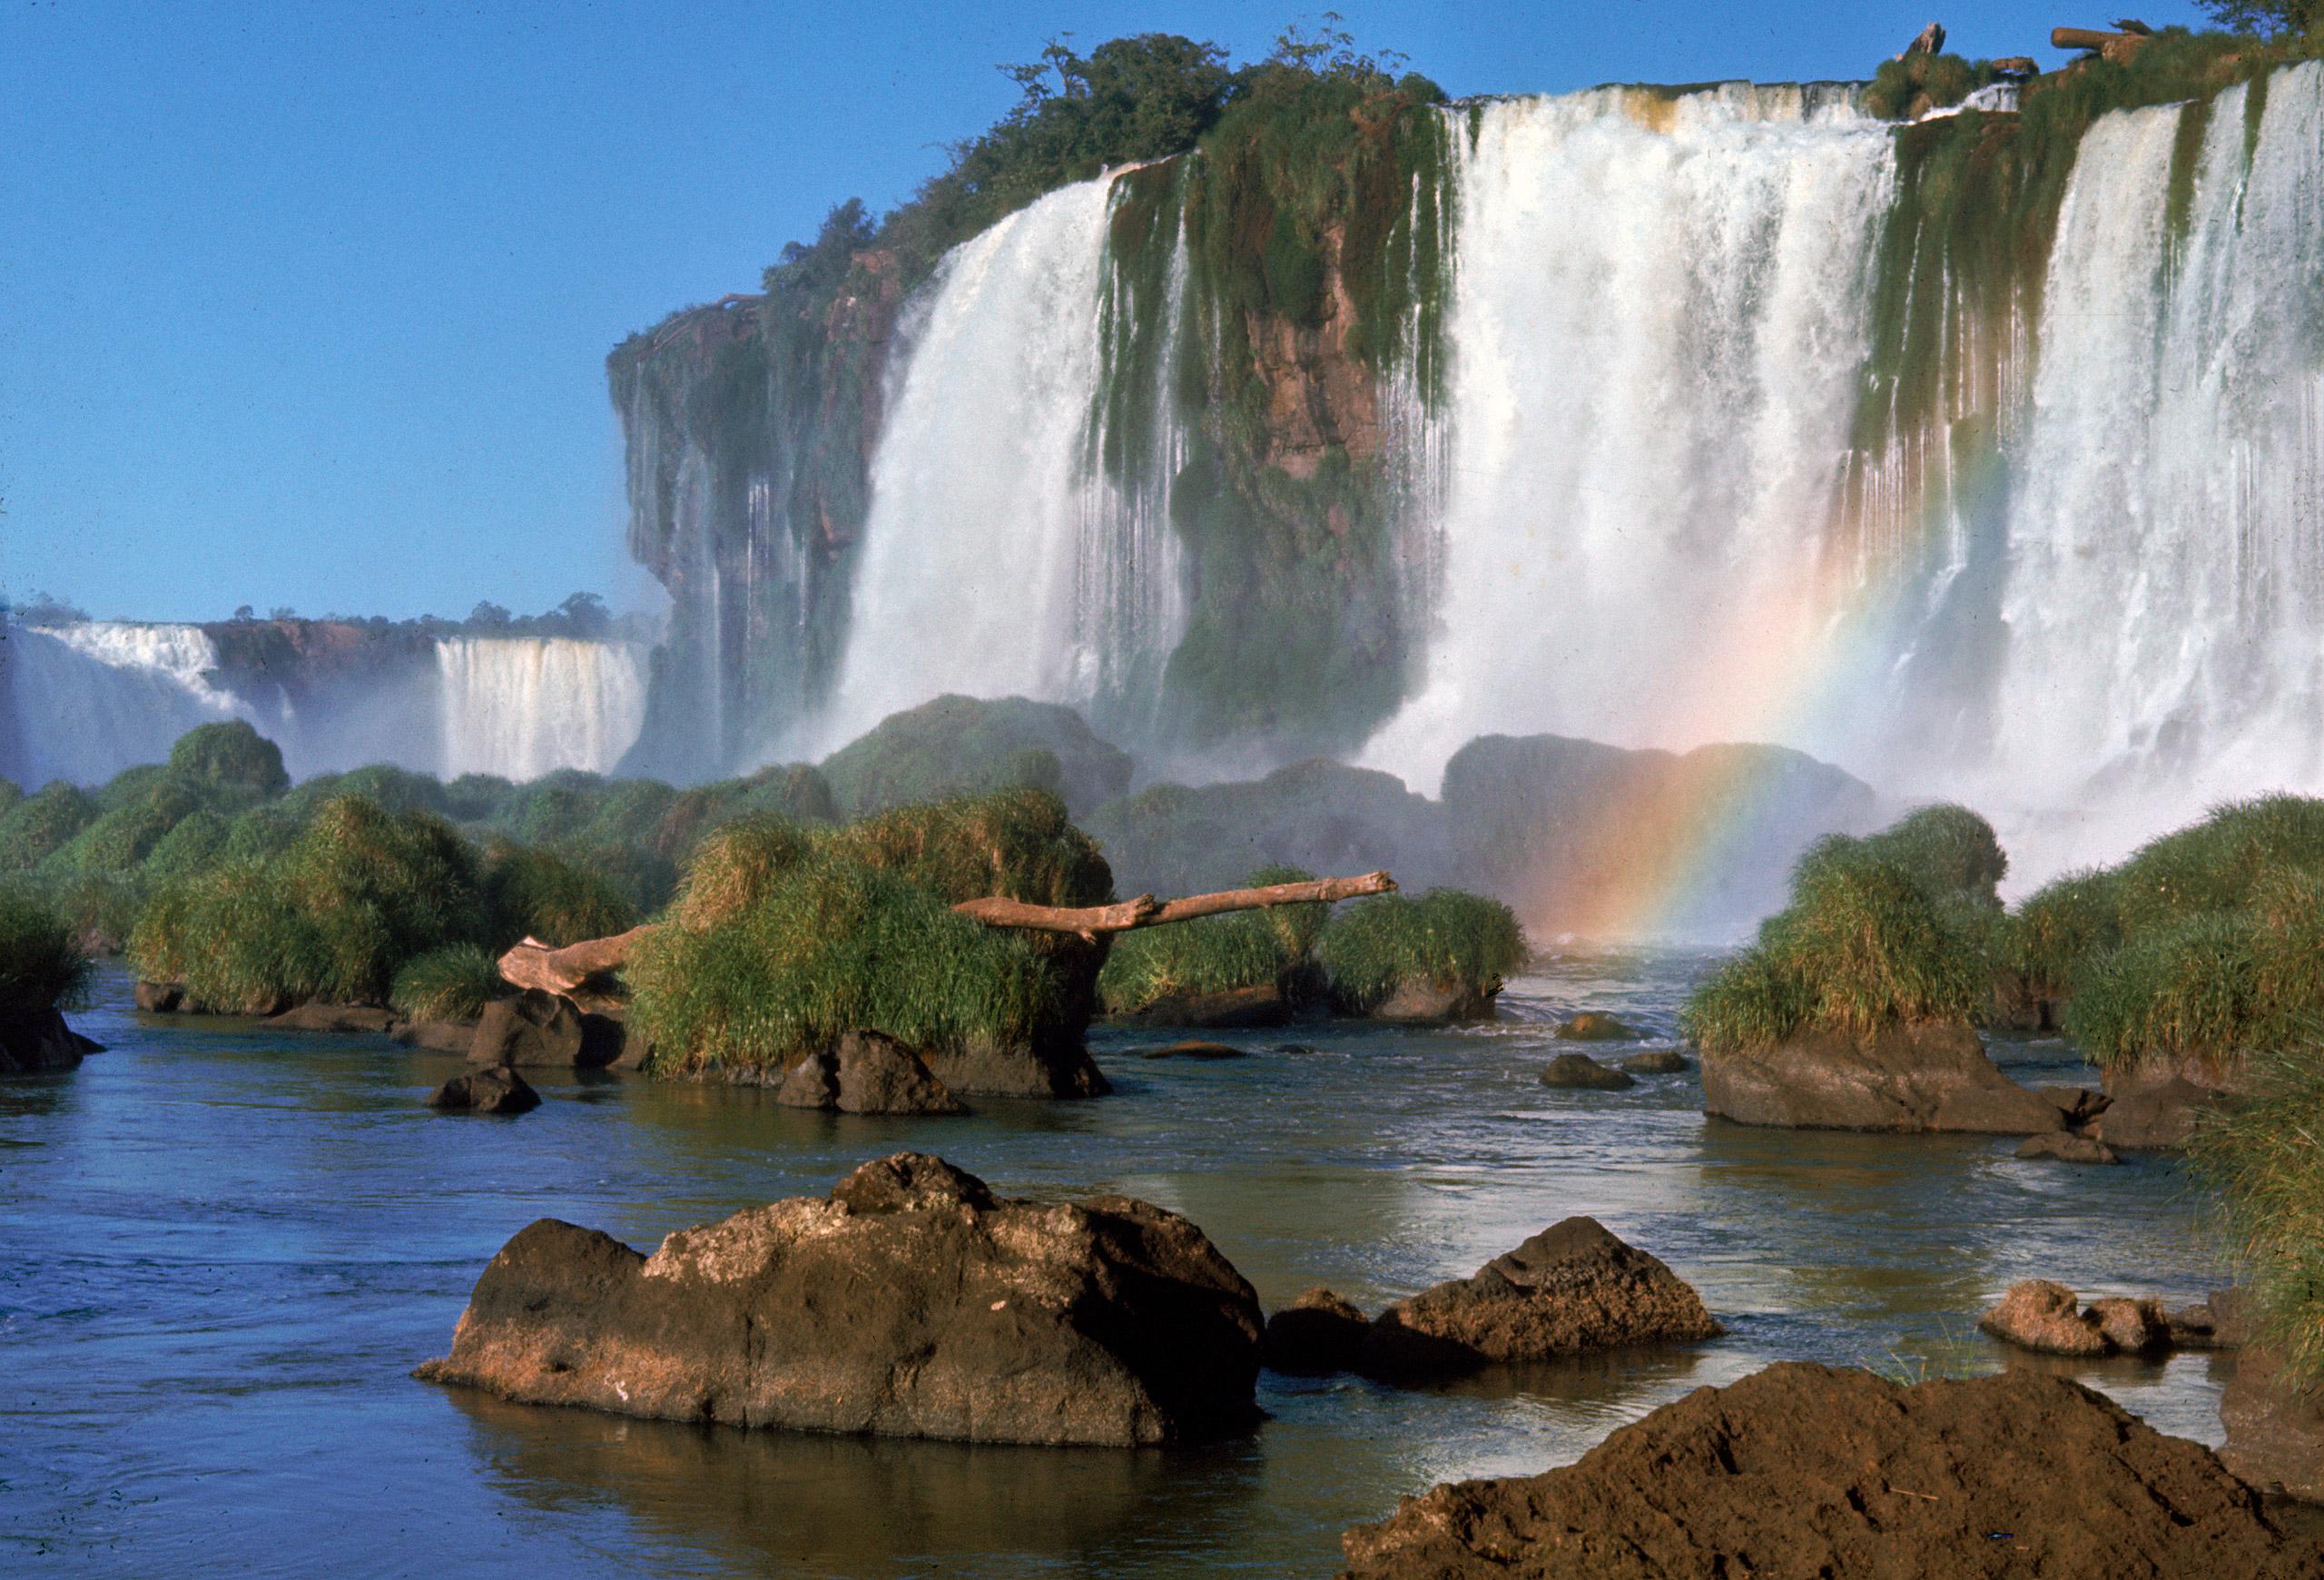 Waterfall named Iguassu or Iguacu Falls, formerly known as Santa Maria Falls, on the Brazil-Argentina border. 1960.